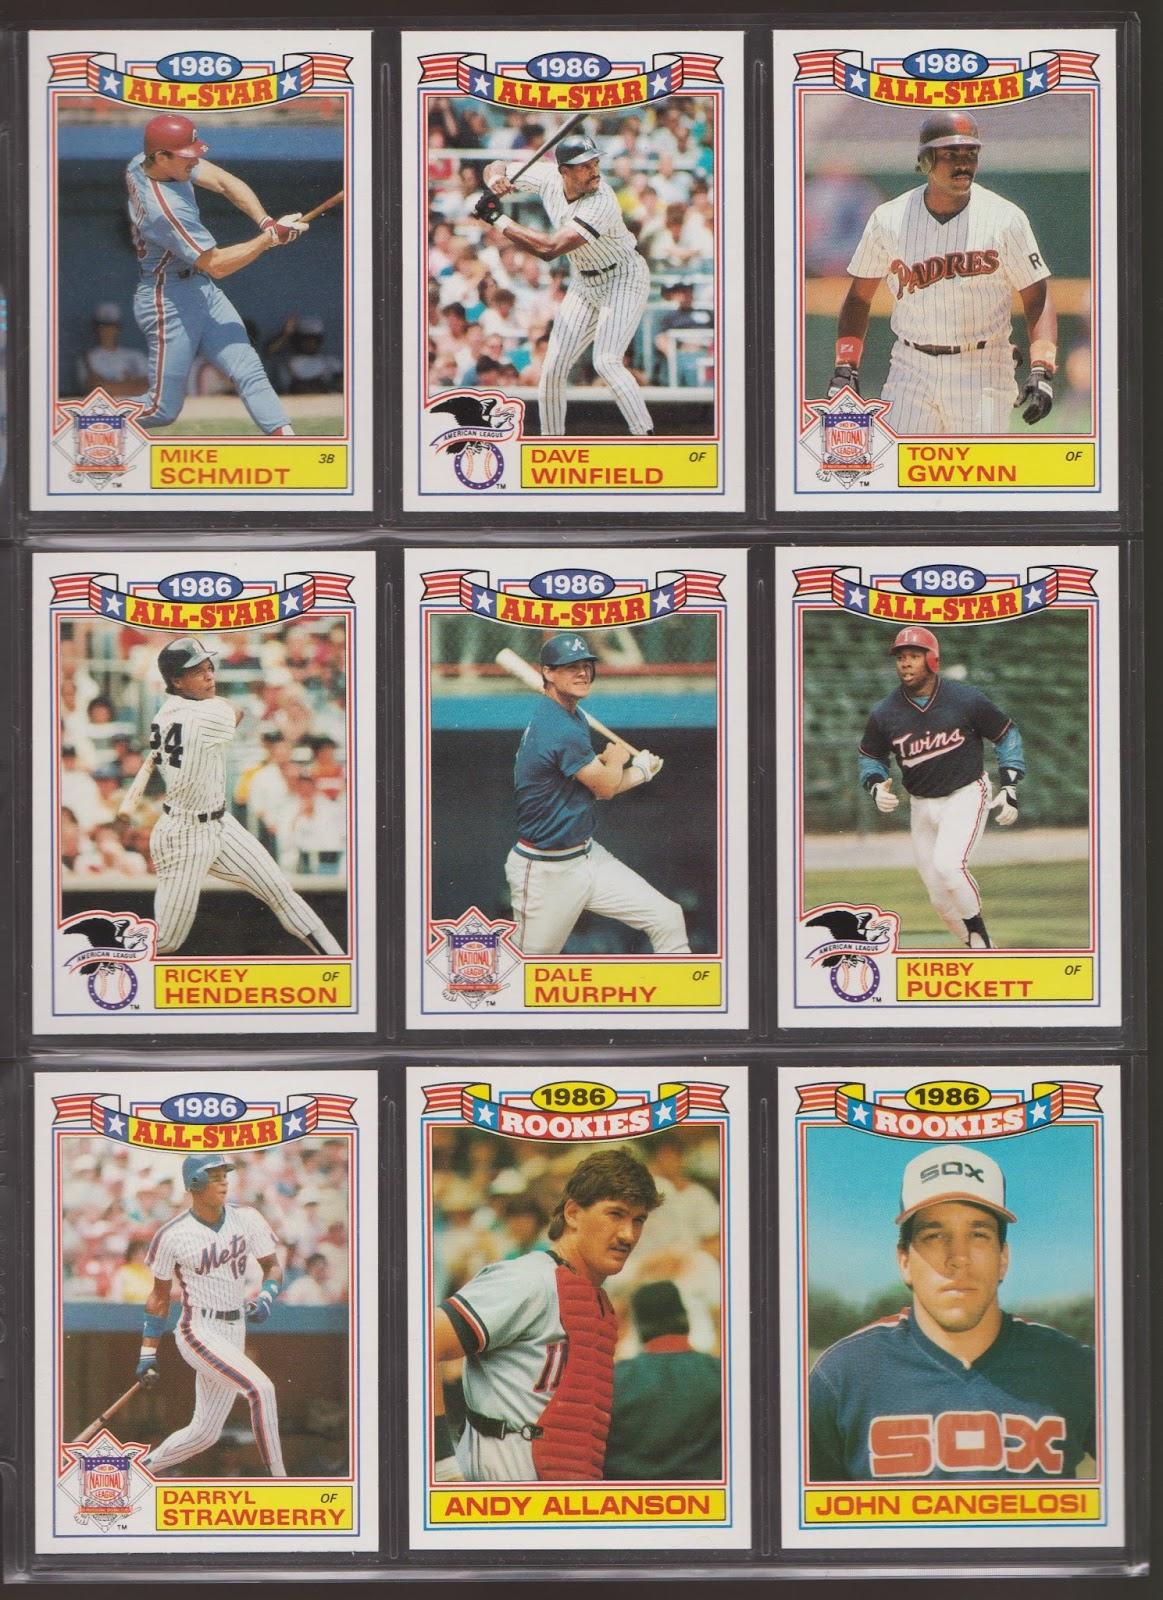 20th Century Topps Baseball 1987 Topps 86 Rookies